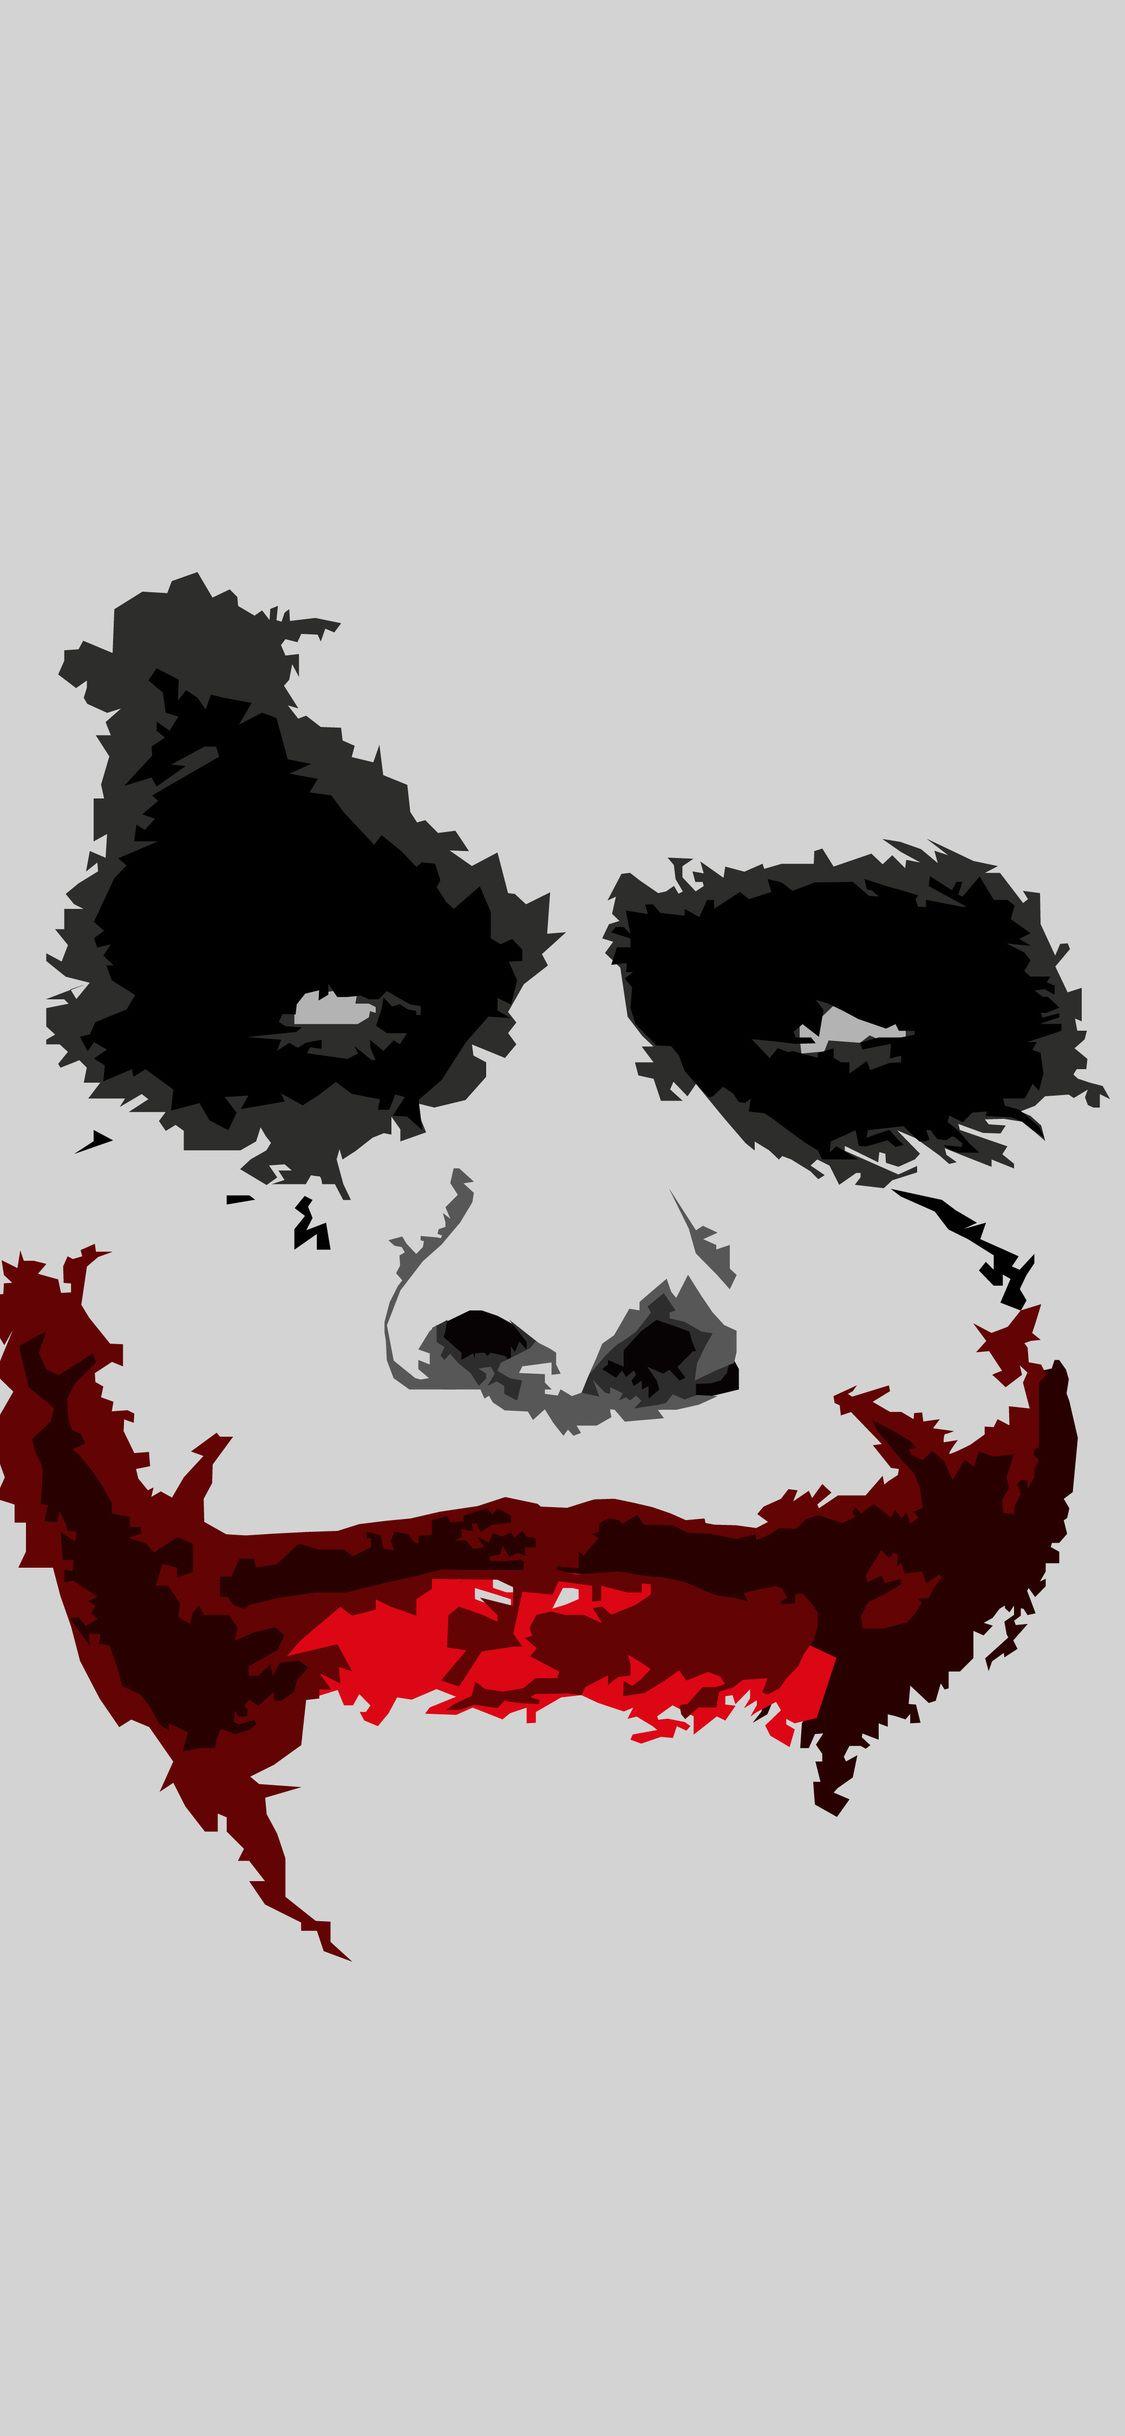 Joker 8k Minimalism Iphone X DC Marvel Joker iphone 1125x2436